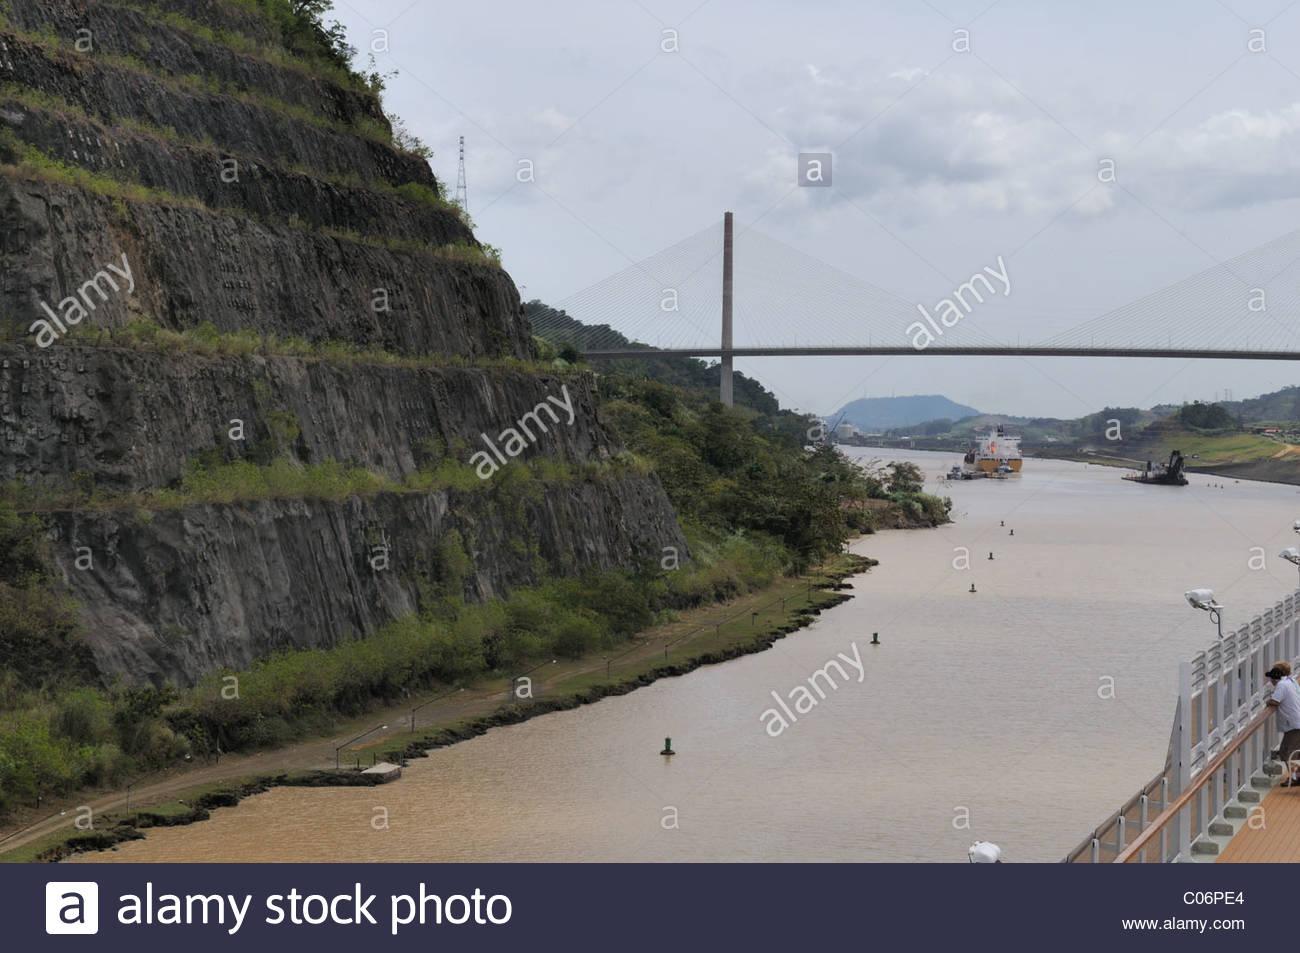 The Gaillard Cut on the Panama Canal with the Centennial Bridge 1300x953